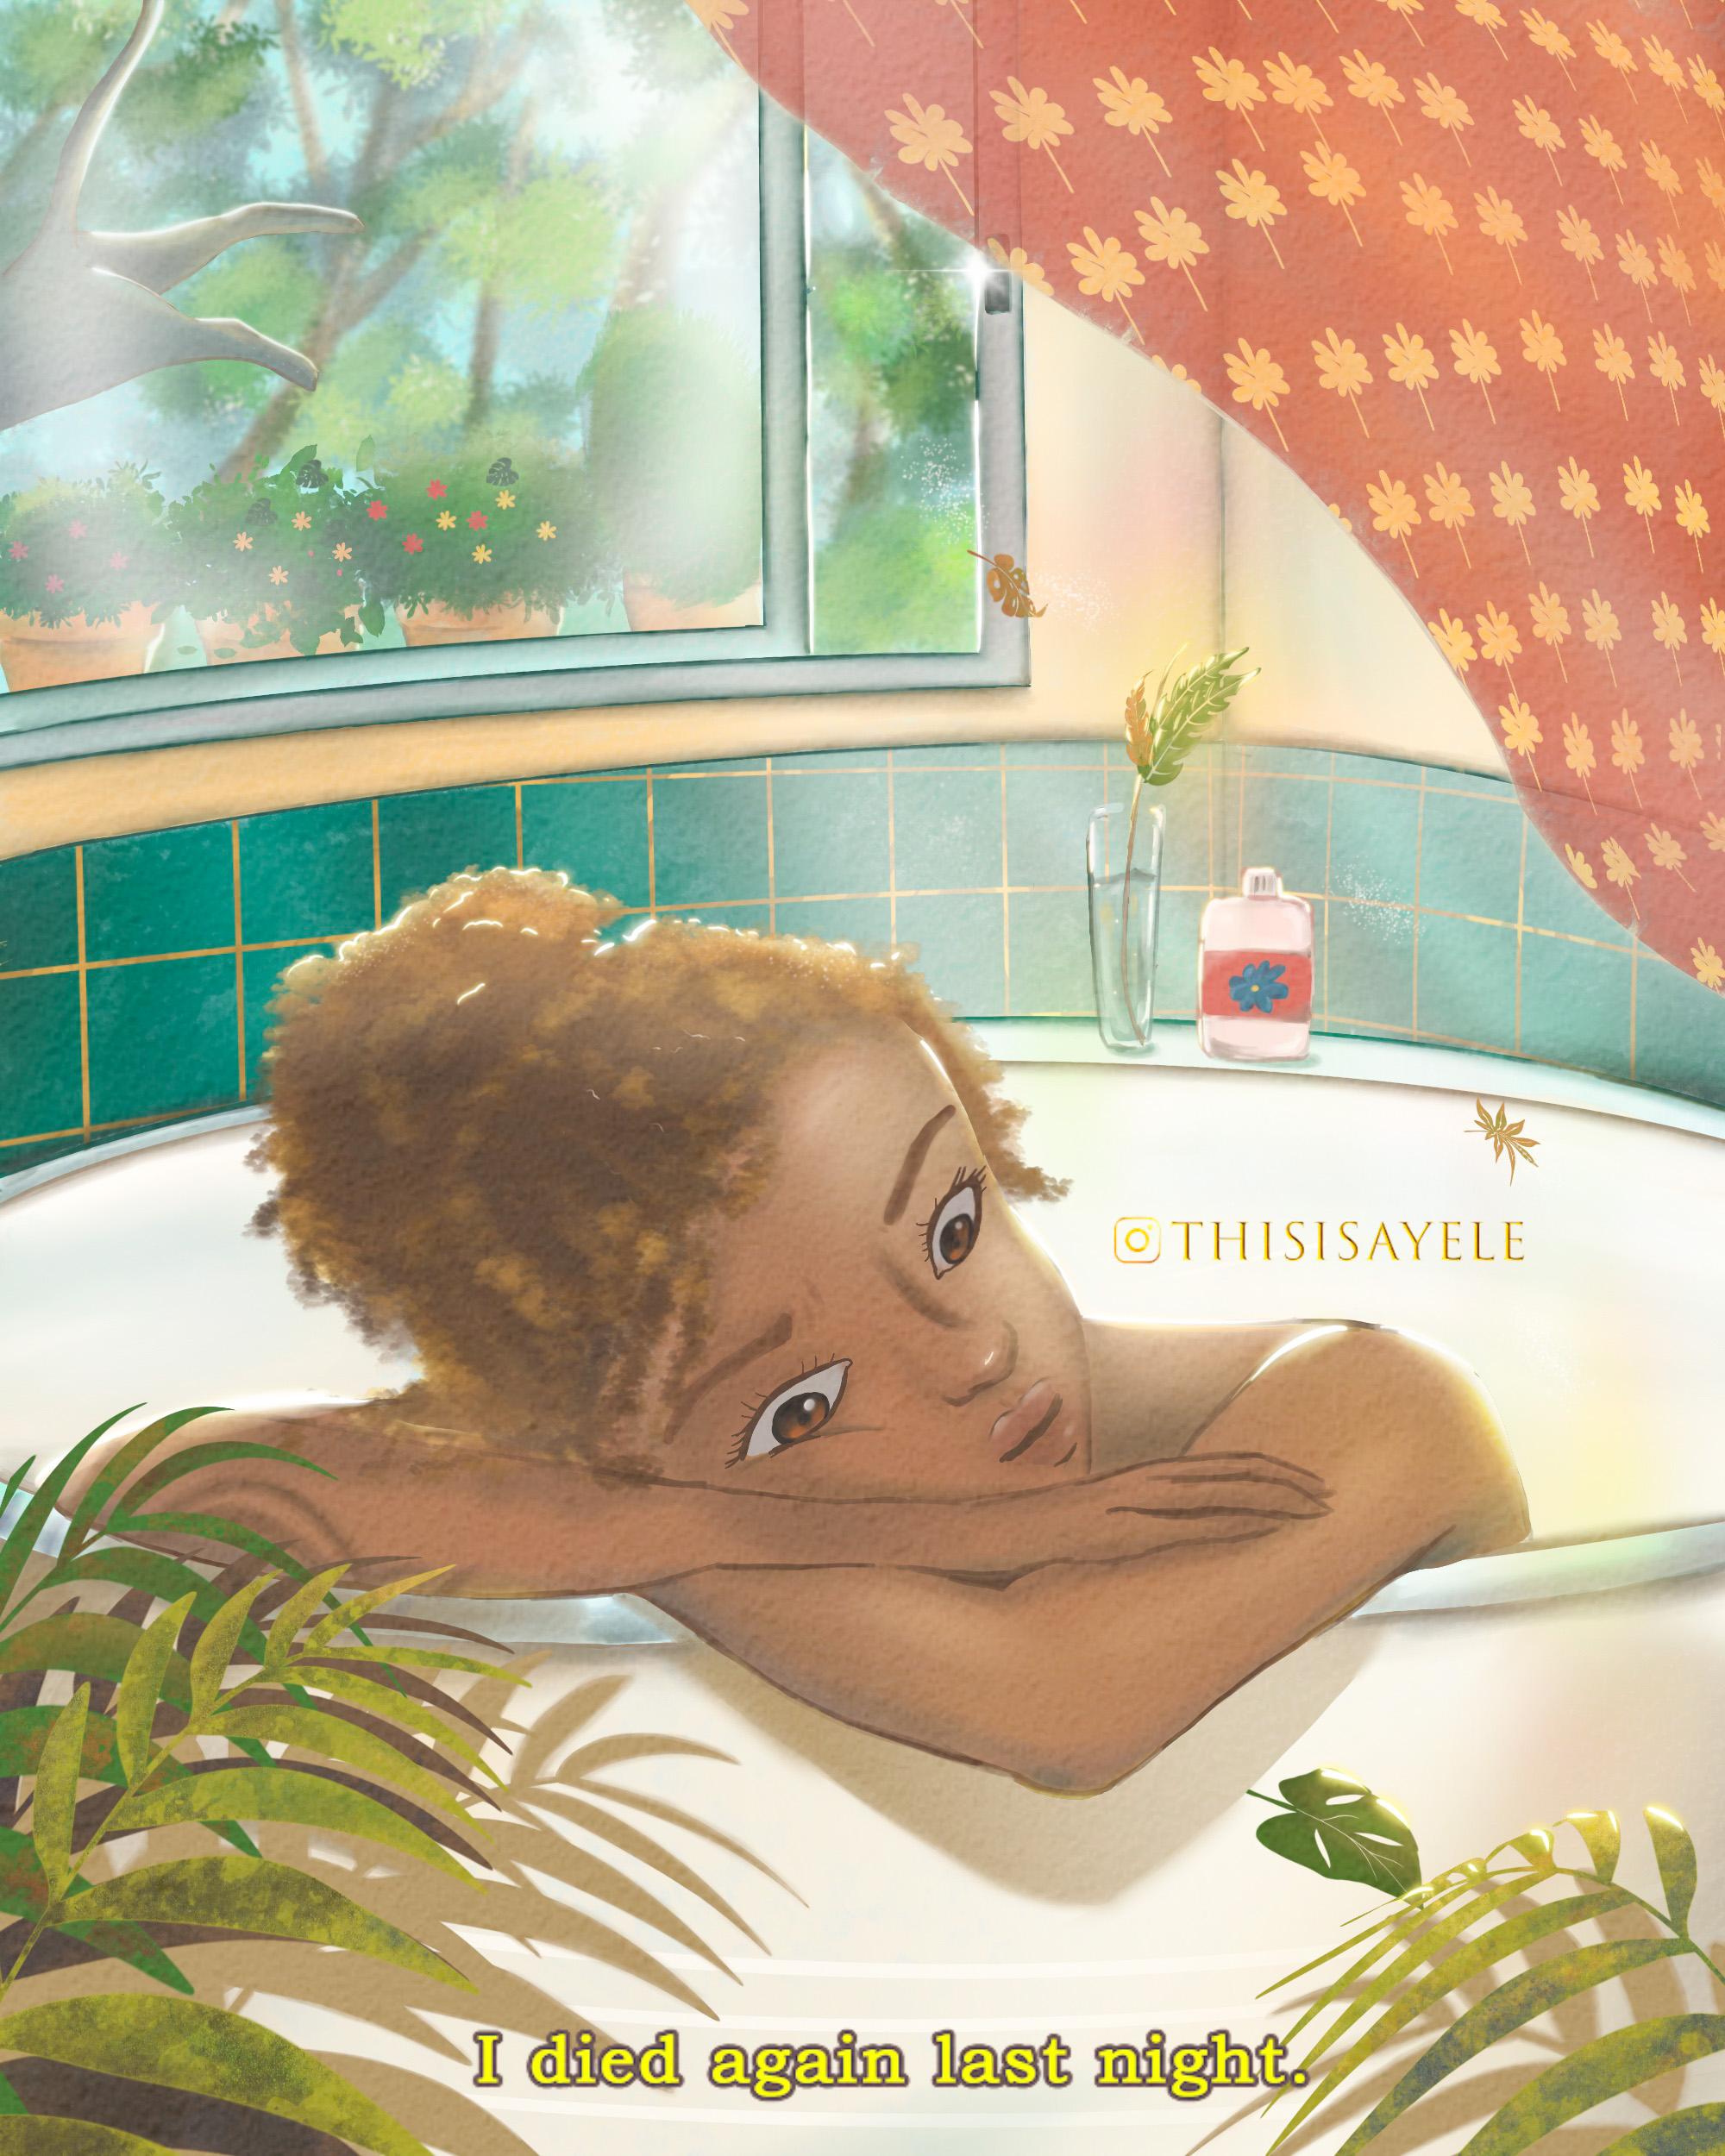 Bathtub thoughts